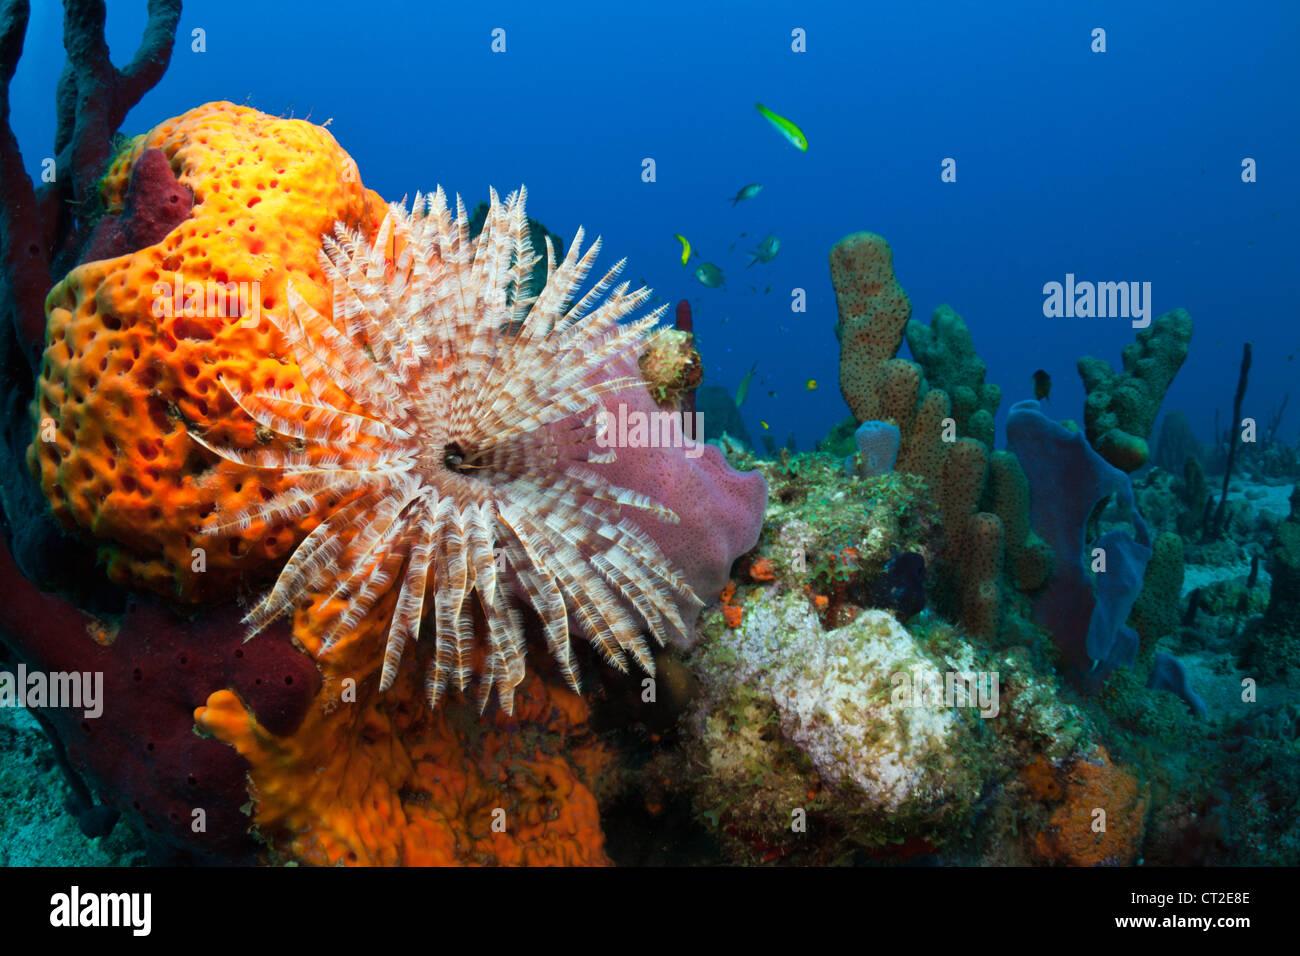 Caribbean Coral Reef, Caribbean Sea, Dominica Stock Photo